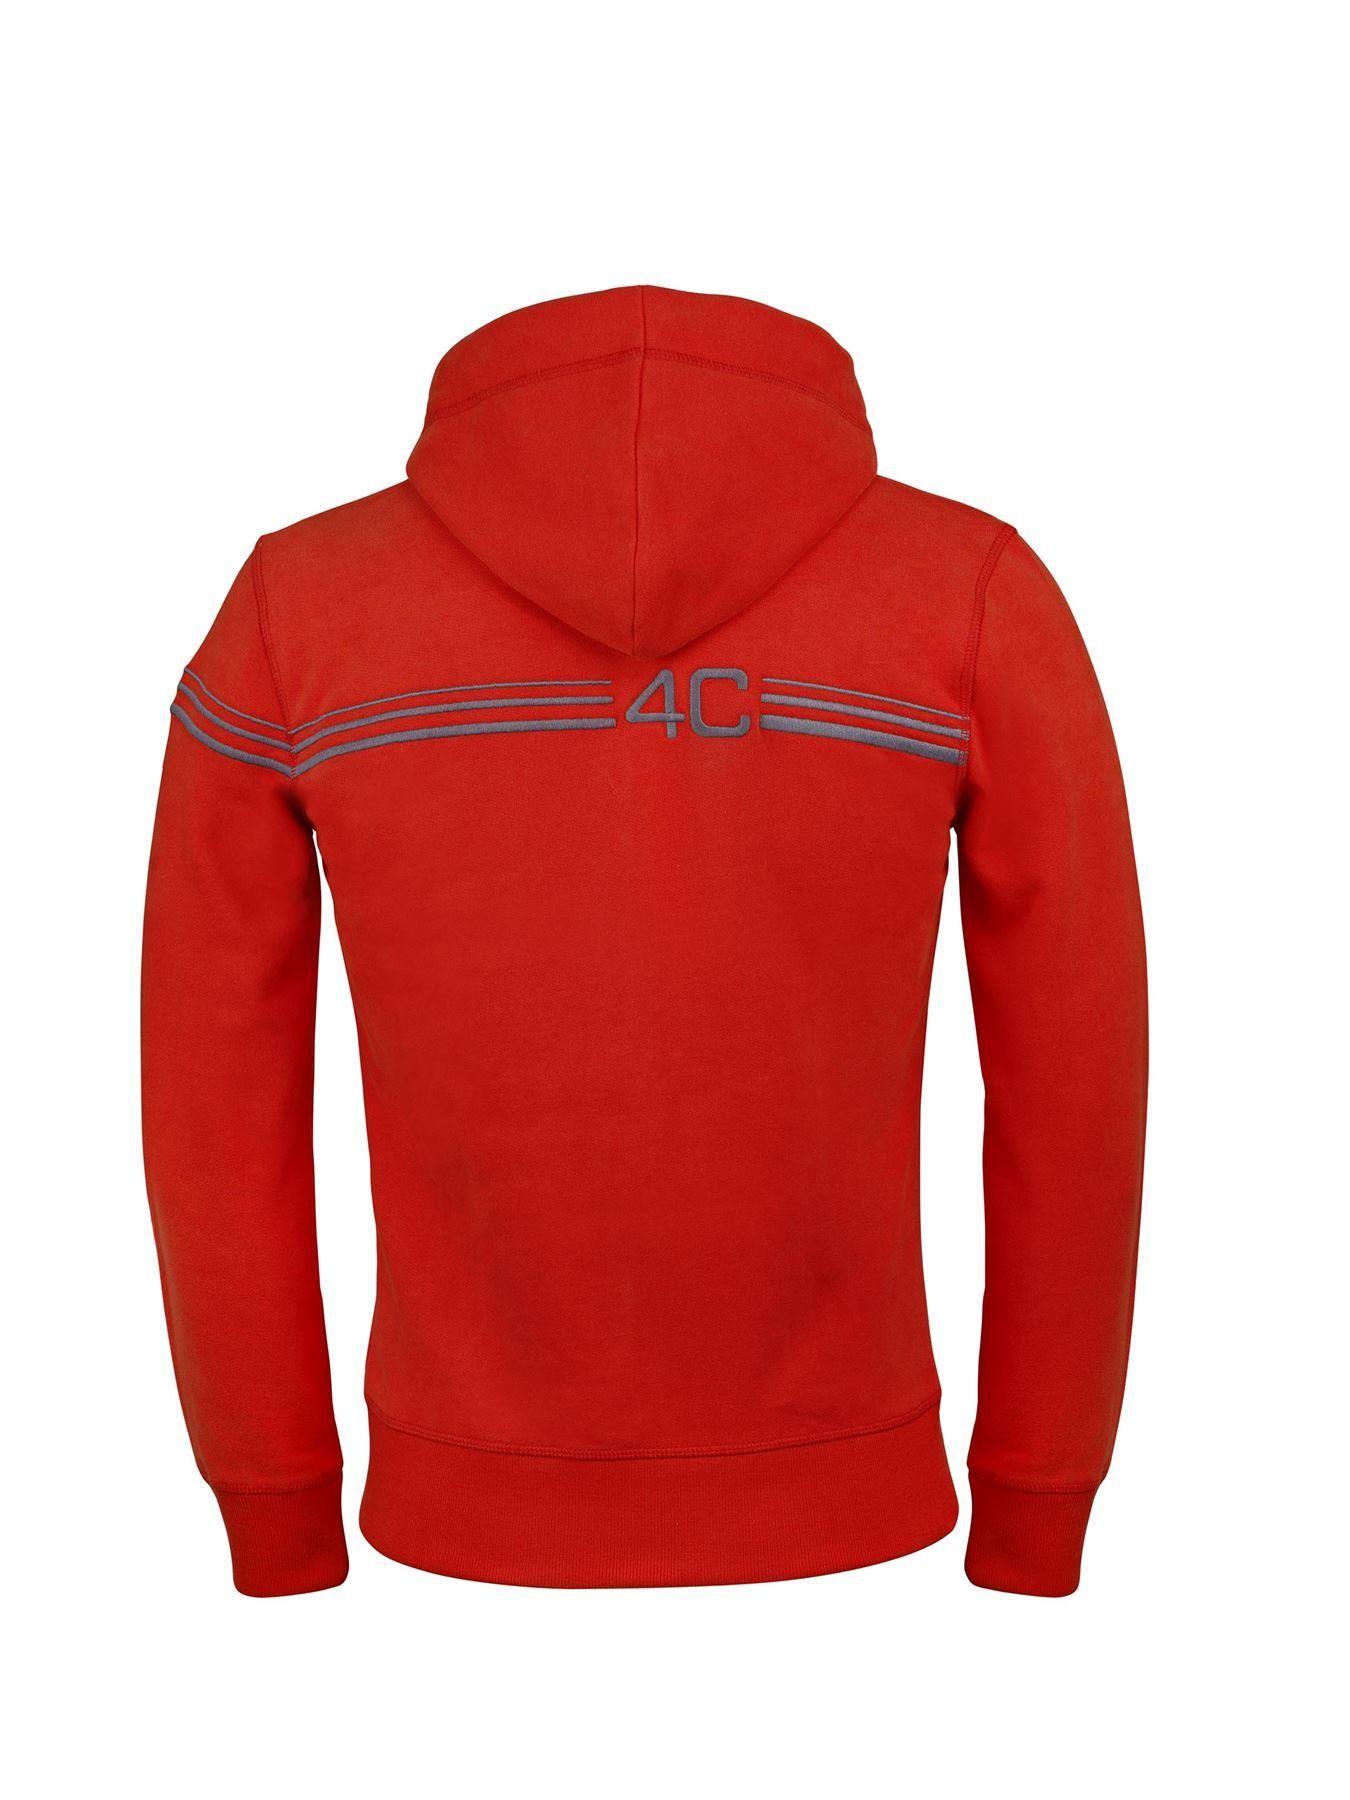 4C Merchandise Unisex Red Hoodie/Jacket Medium - 5916724